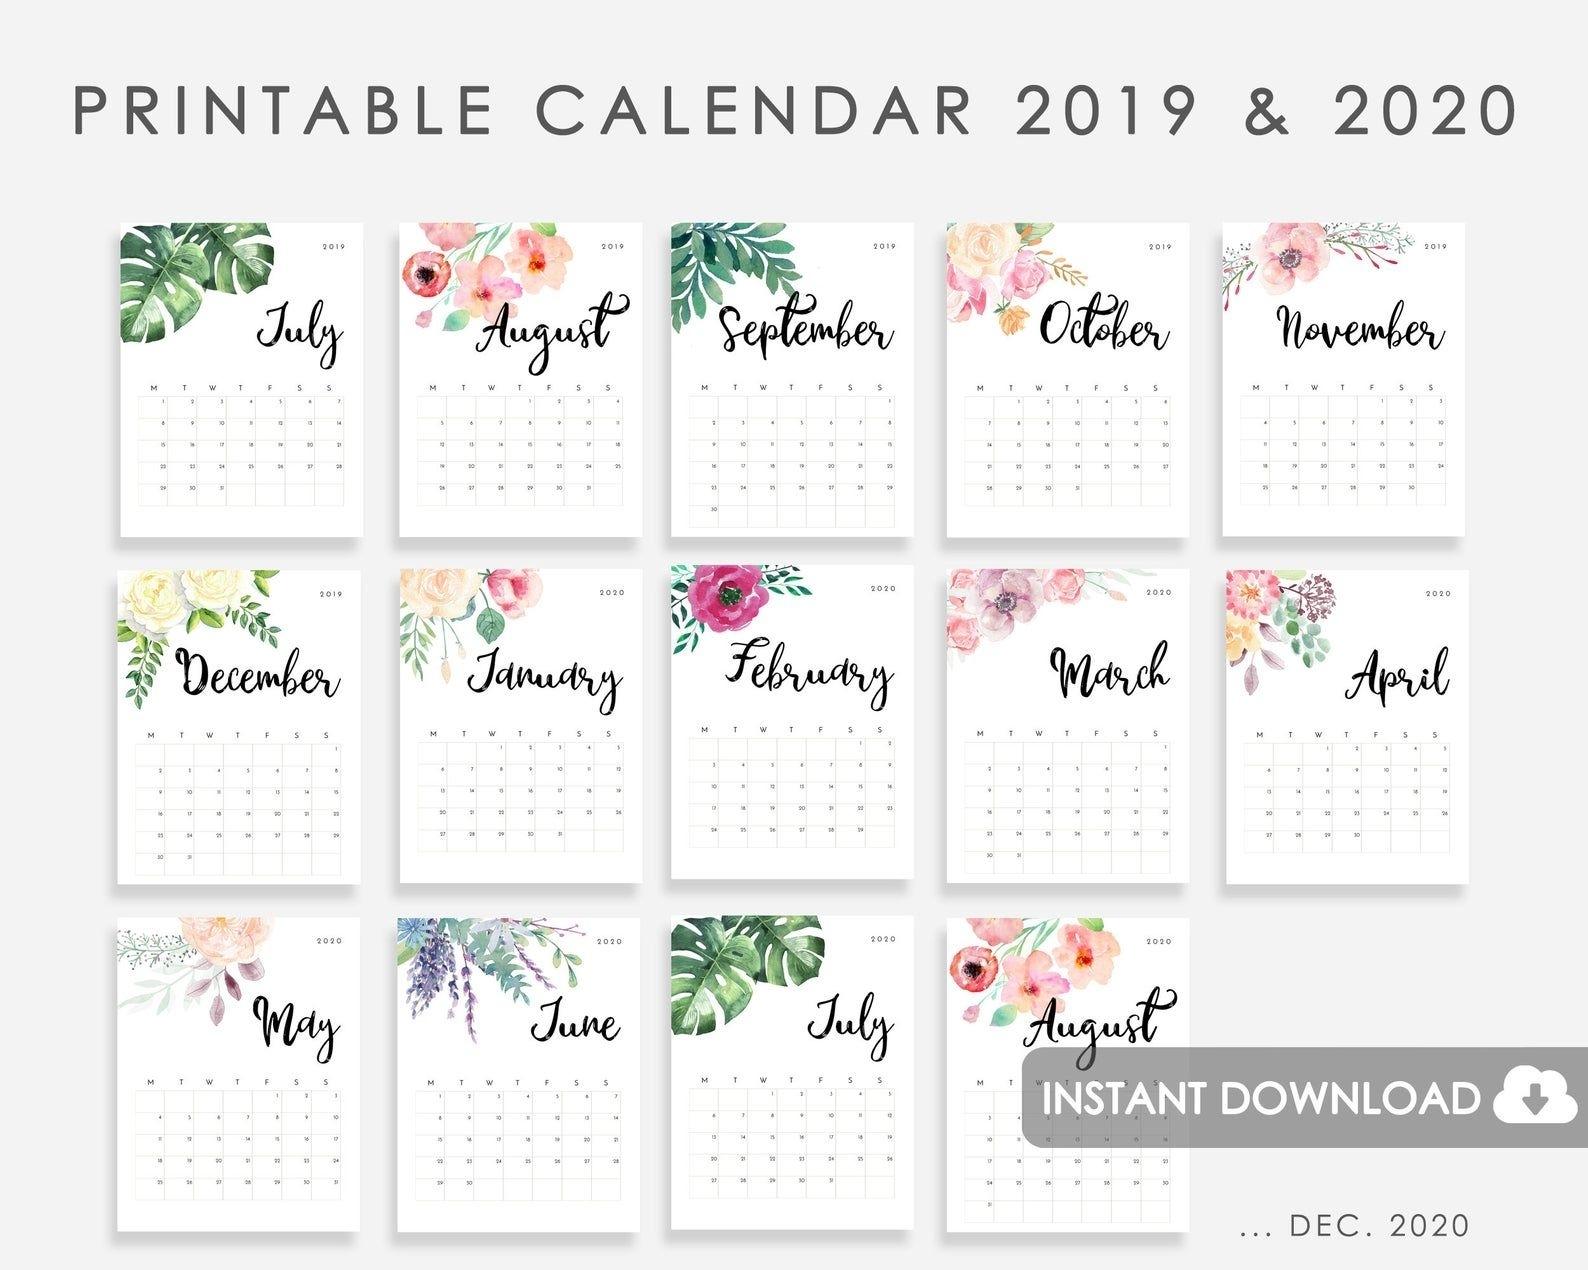 Calendar 2019-2020 Printable, Calendar Watercolor Flowers